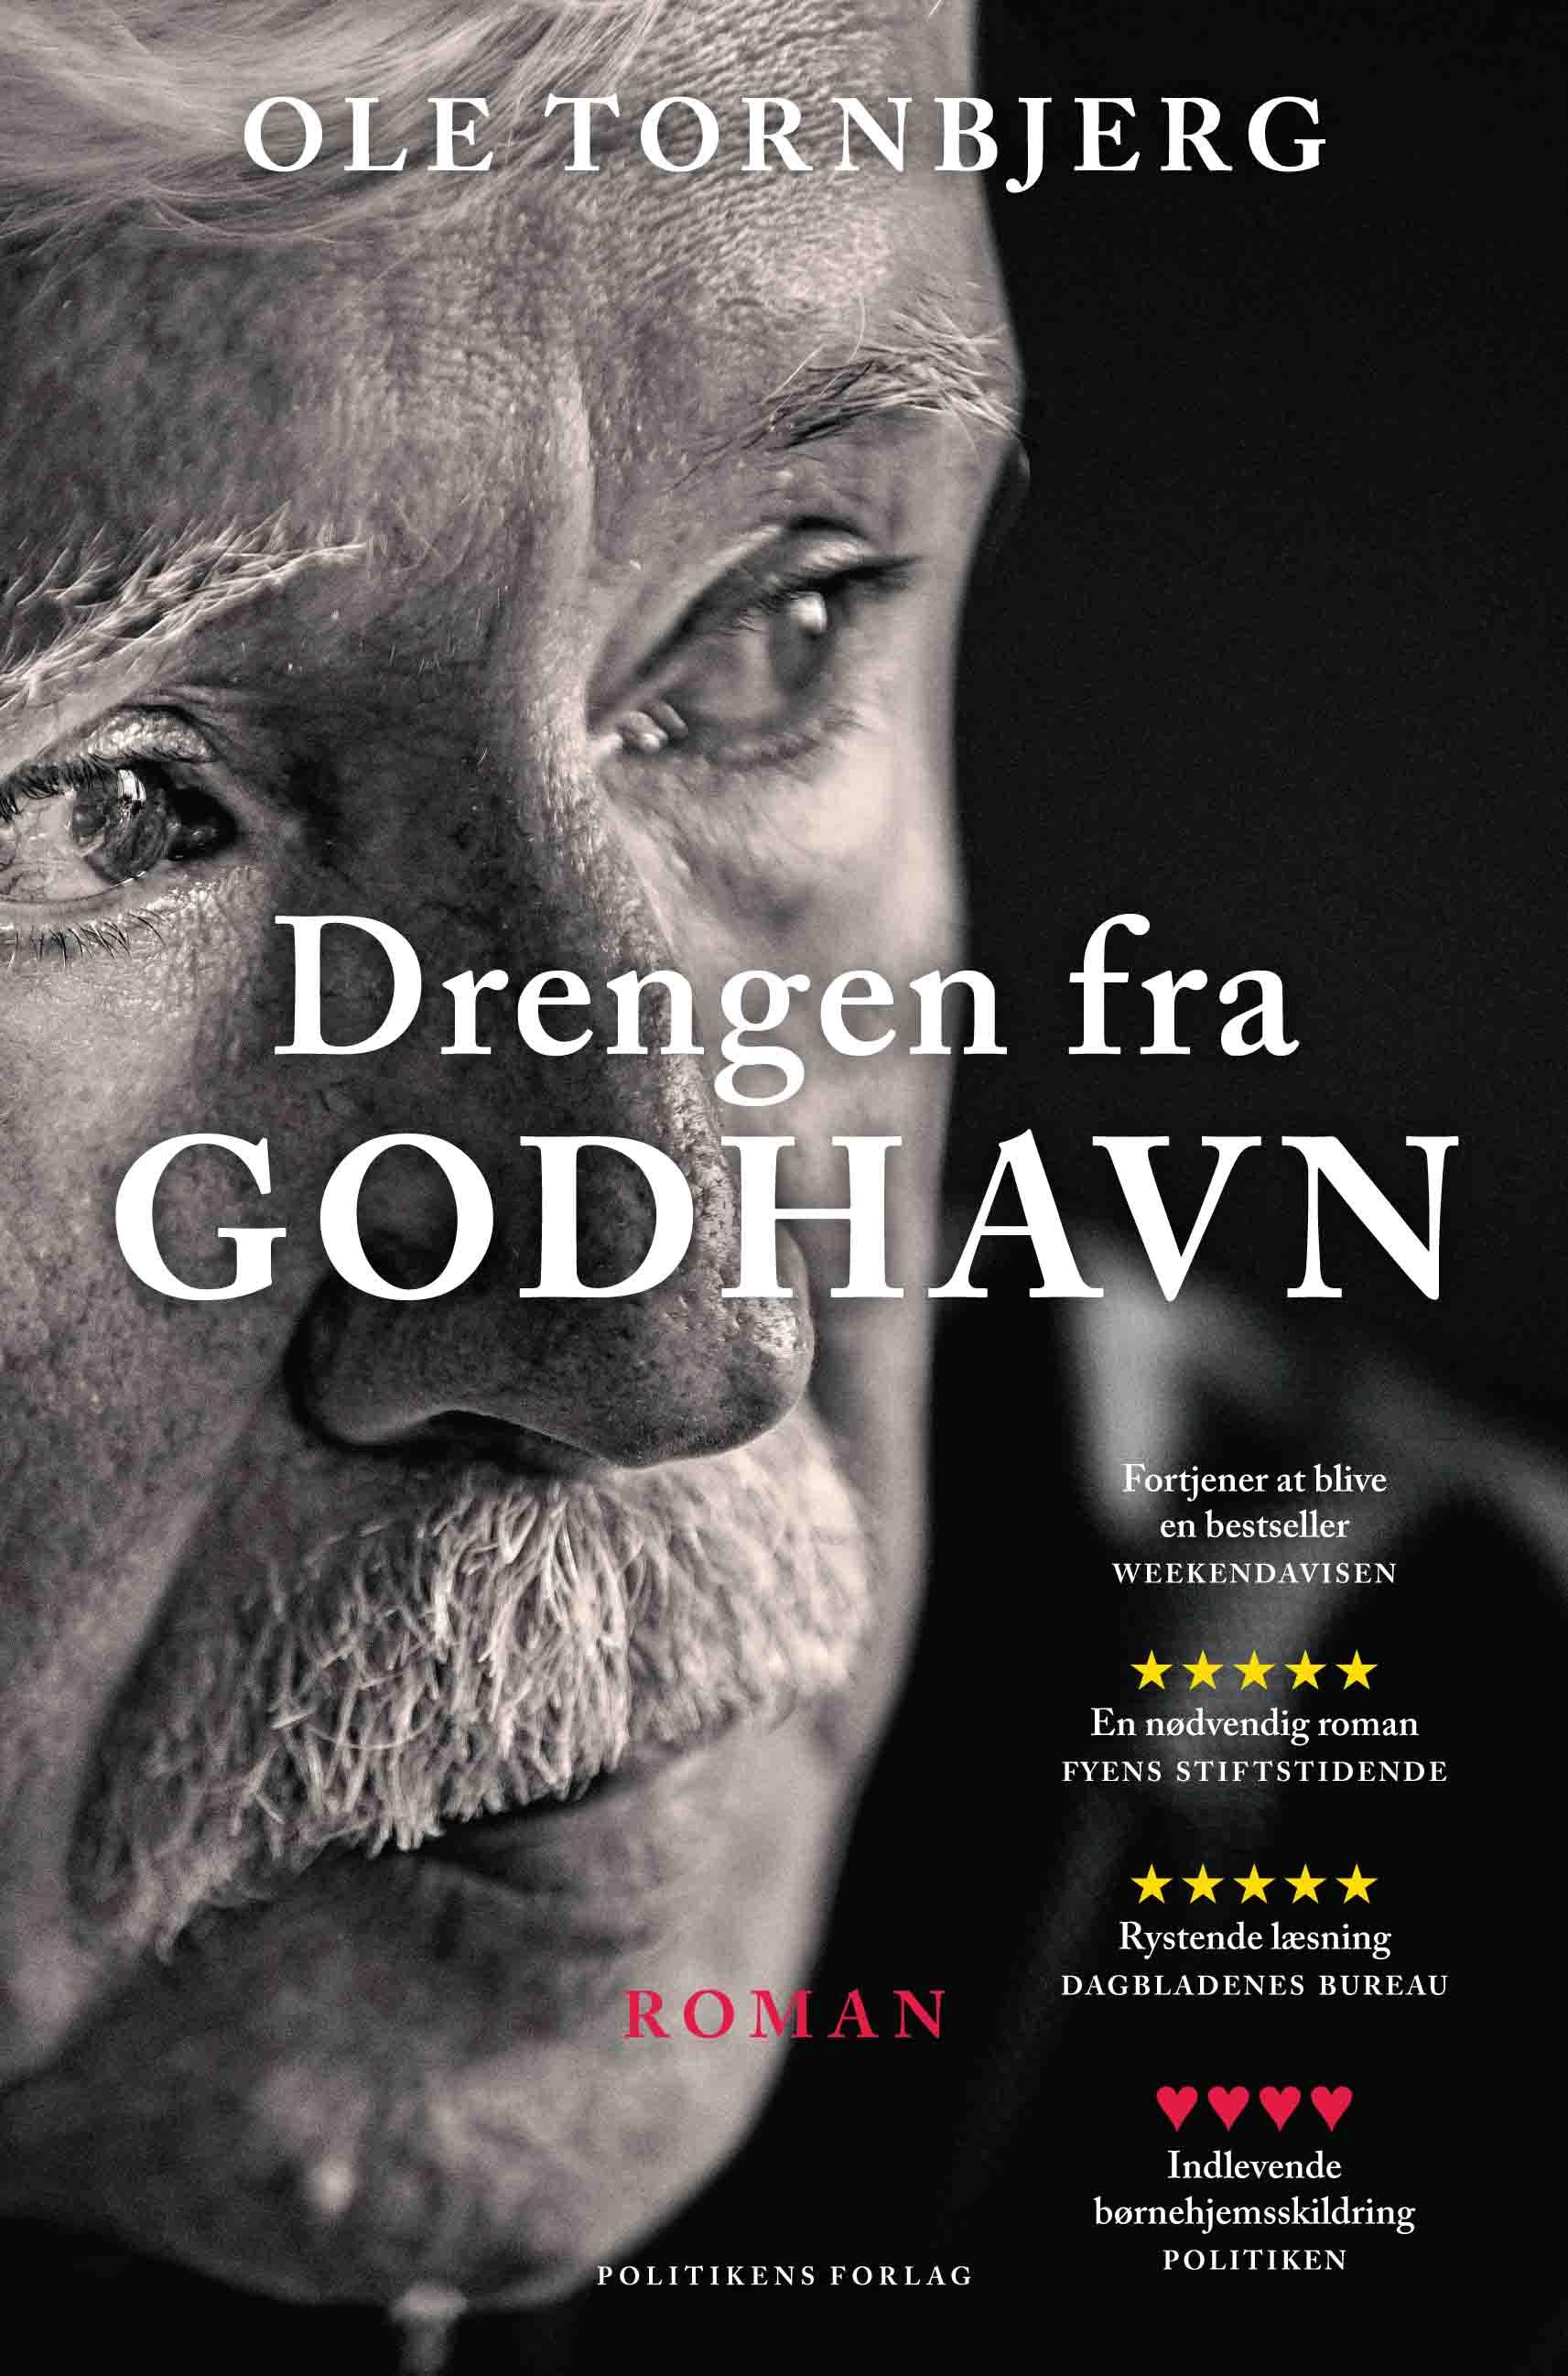 Drengen fra Godhavn - Ole Tornbjerg - Bøger - Politikens Forlag - 9788740059823 - 24/10-2019